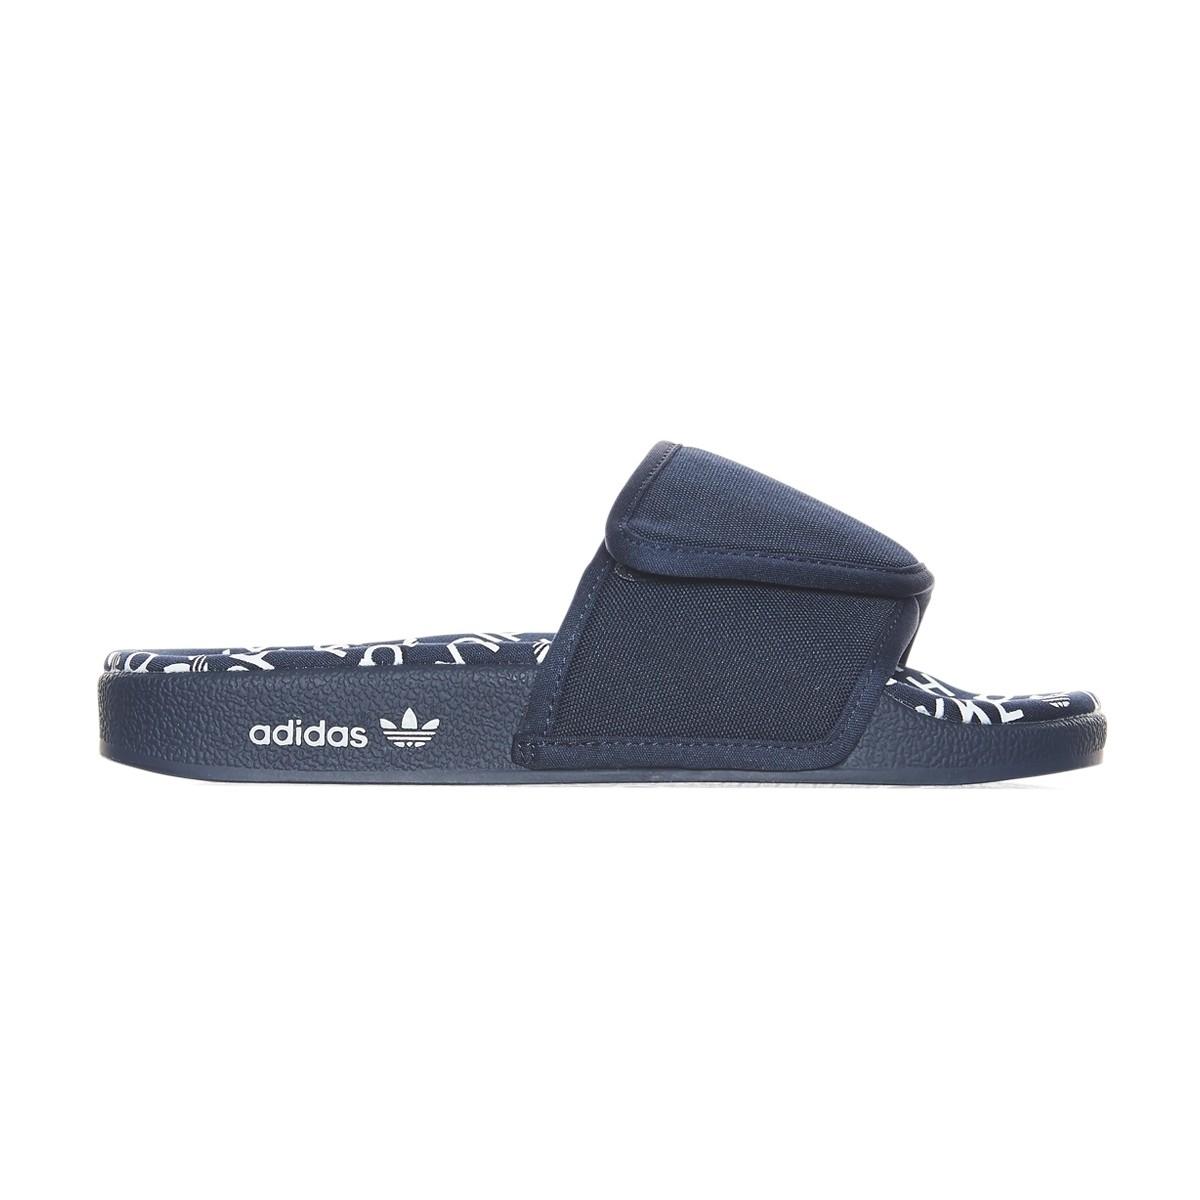 21ad5da78 Lyst - adidas Originals Hyke Wmns Aoh-008 Slides in Black for Men